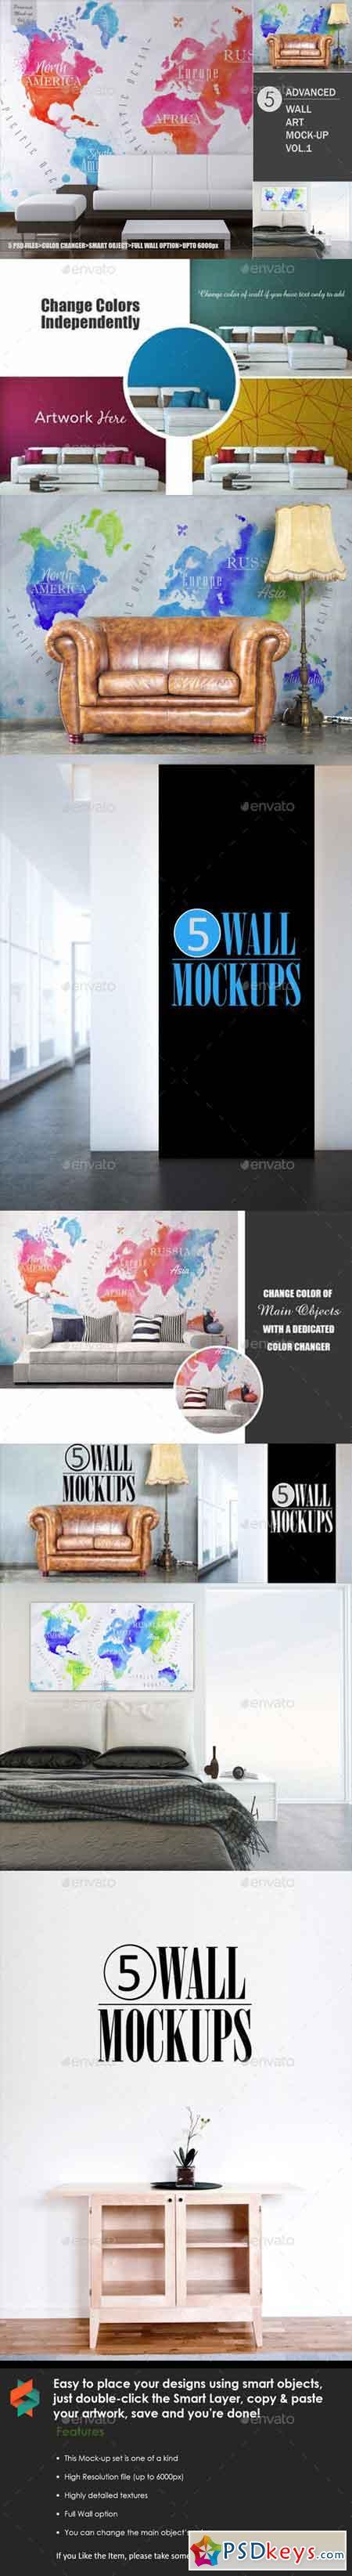 5 Advanced Wall Art Mock-ups vol.1 13227733